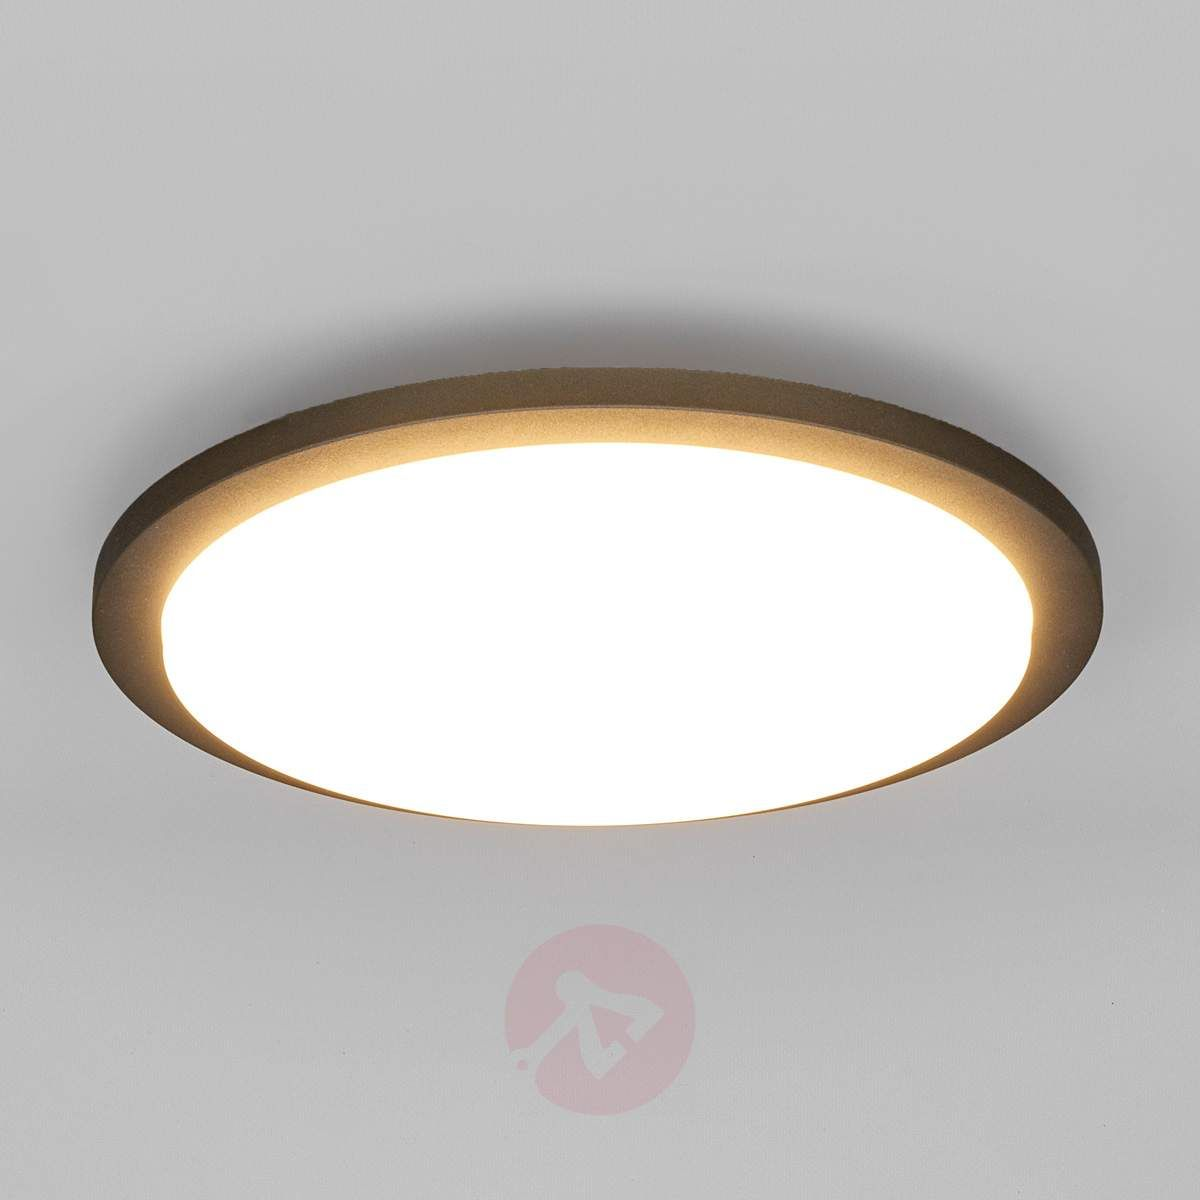 Lampa Sufitowa Zewnętrzna Benton Z Led Lampy Sufitowe